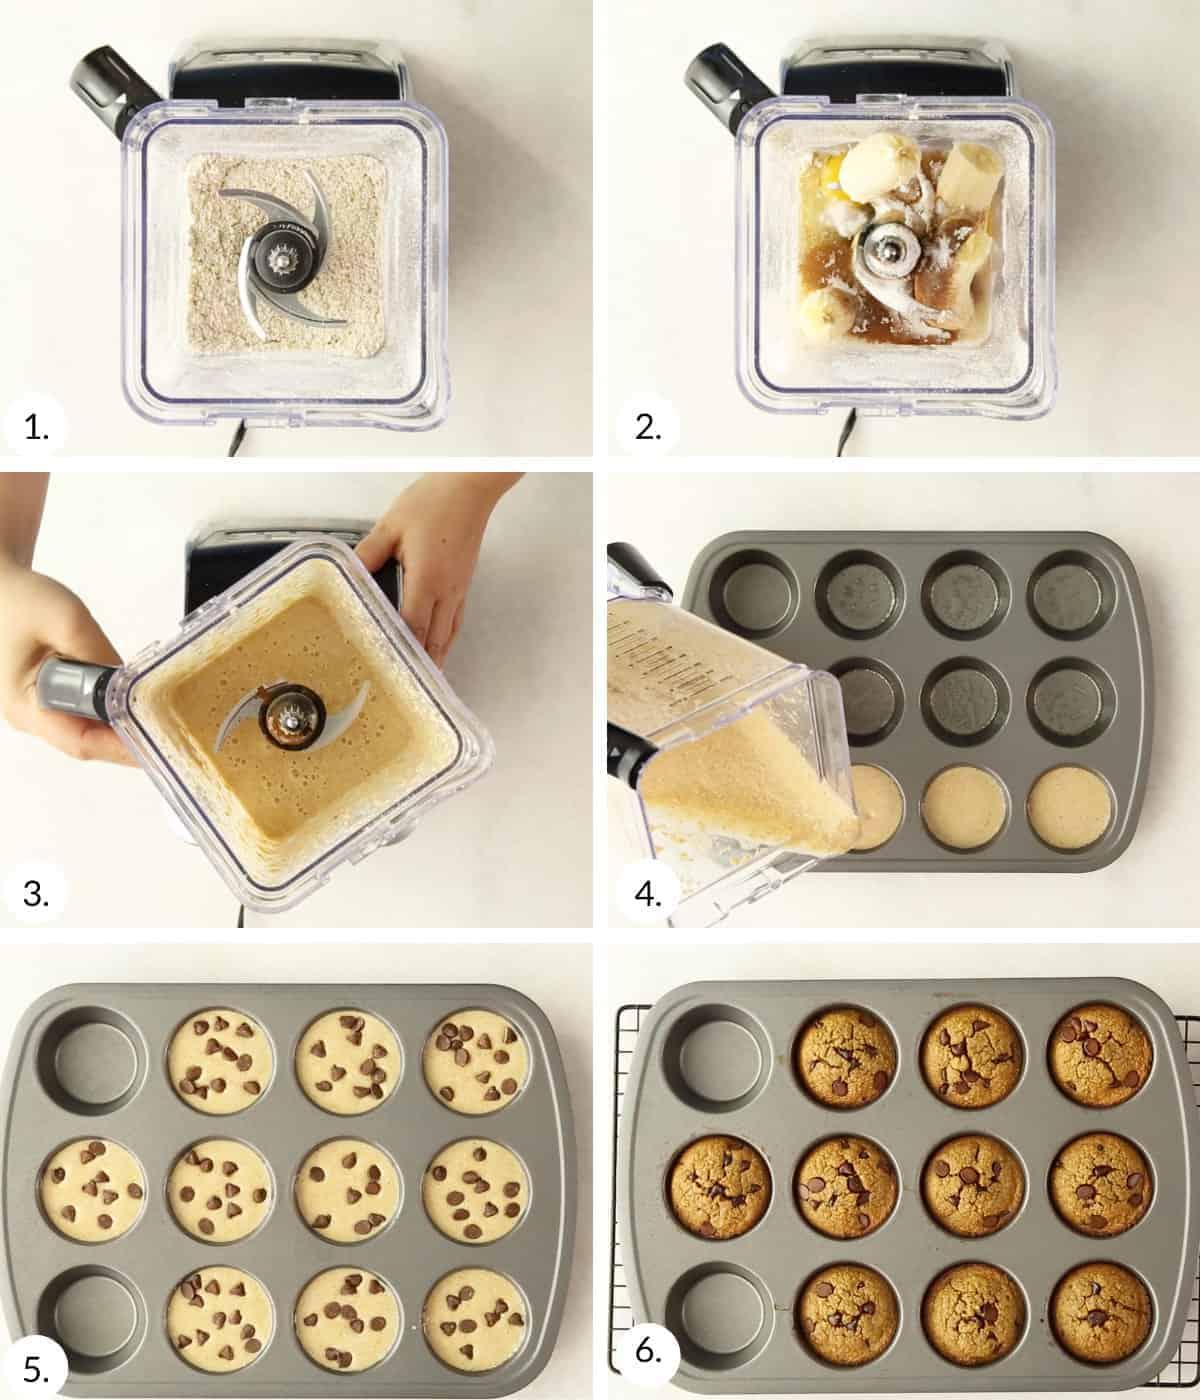 how-to-make-banana-oatmeal-muffins-step-by-step